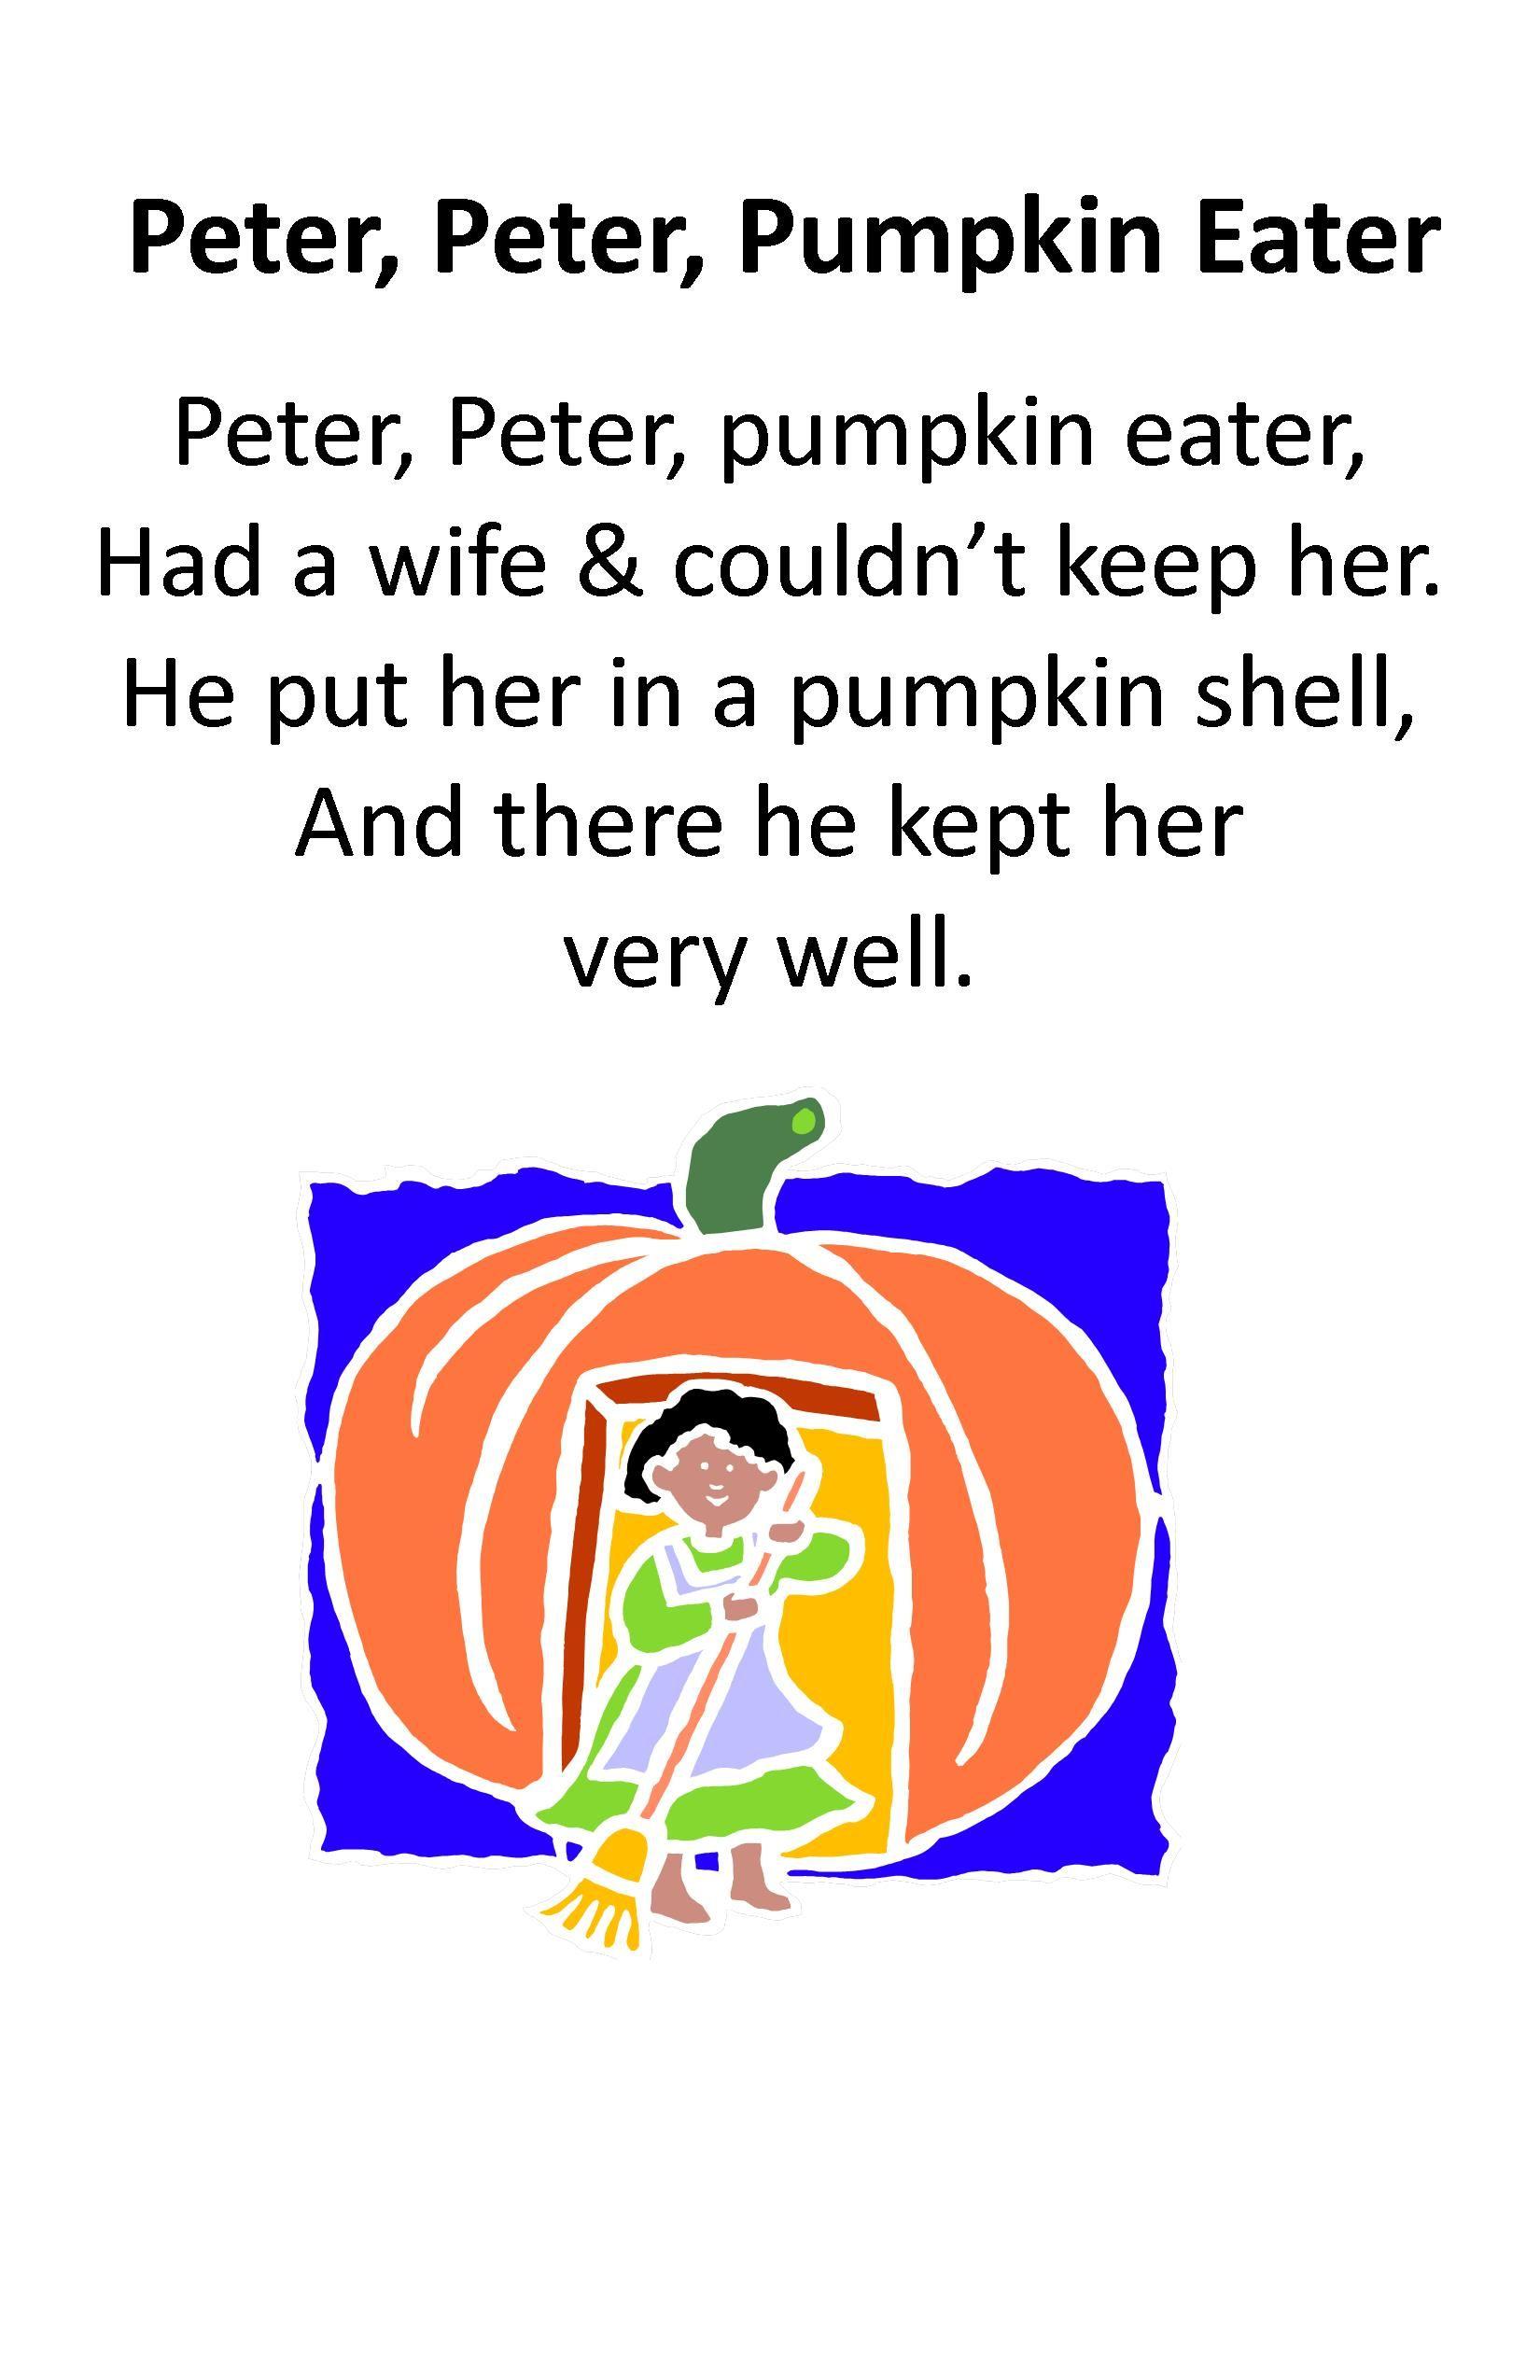 pumpkin rhymes preschool itty bitty rhyme pumpkin eater itty bitty 206